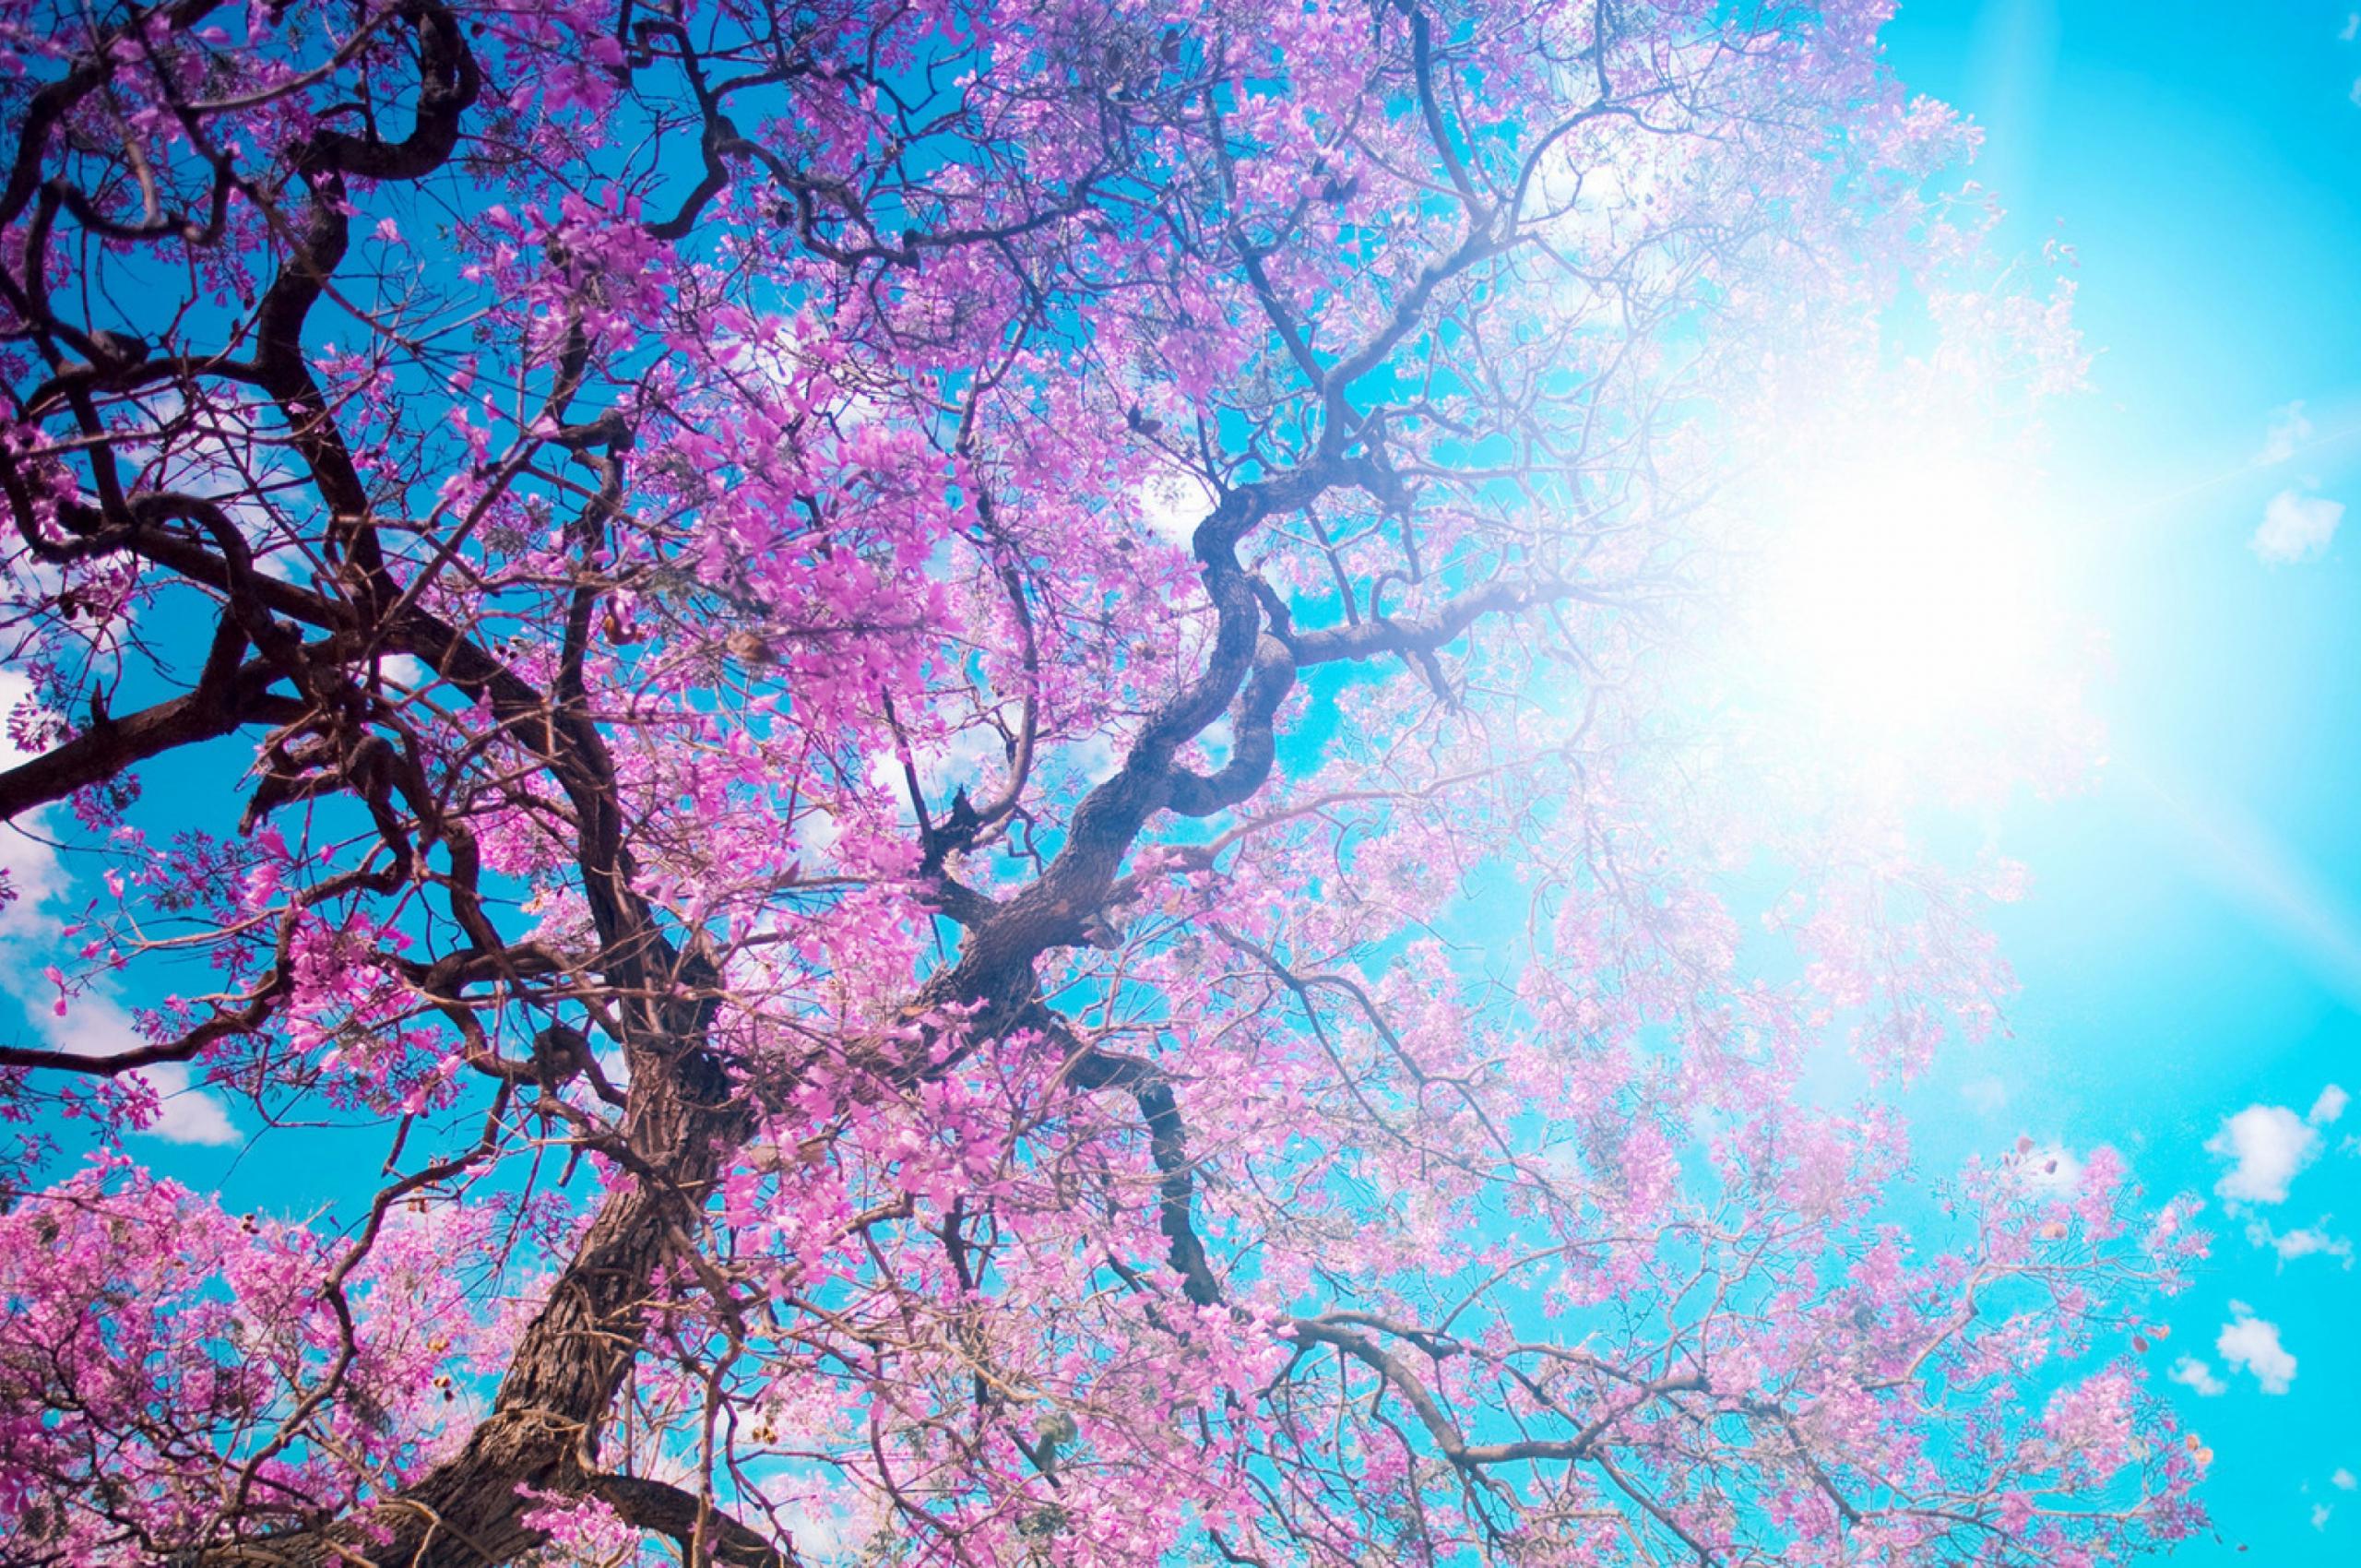 Free Download To Enjoy The Cherry Blossoms Japan Wallpaper Background 4k Ultra Hd 3840x2160 For Your Desktop Mobile Tablet Explore 46 Japan Wallpaper 4k Japanese Desktop Wallpaper 4k Nature